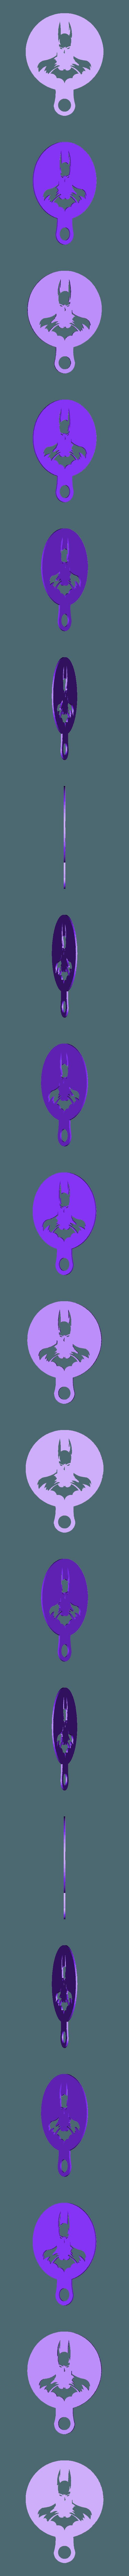 bats.STL Download free STL file Coffee Stencil - Batman • 3D printing model, arifsethi